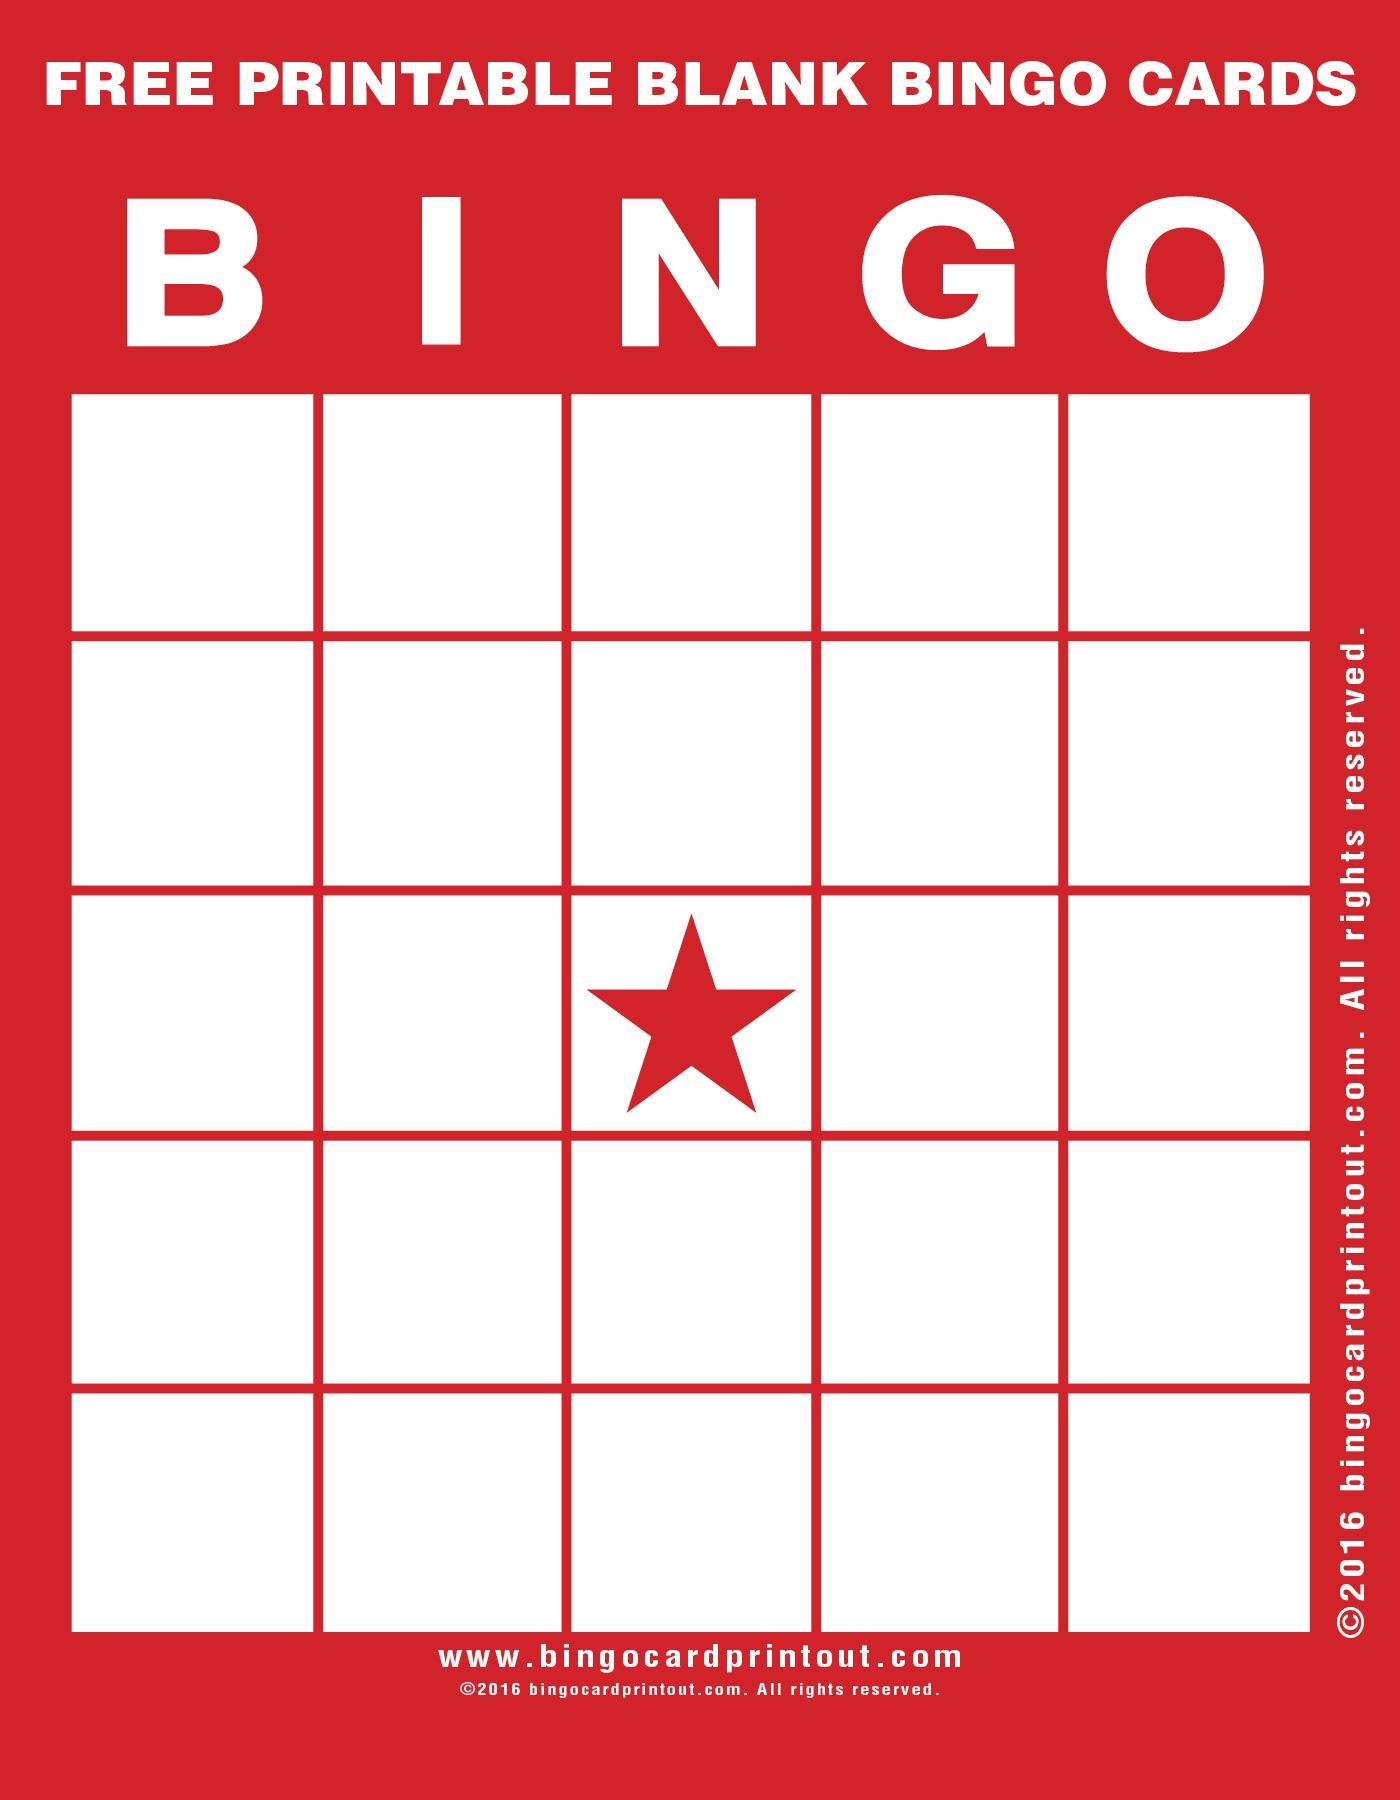 Free Printable Blank Bingo Cards - Bingocardprintout - Free Printable Bingo Cards